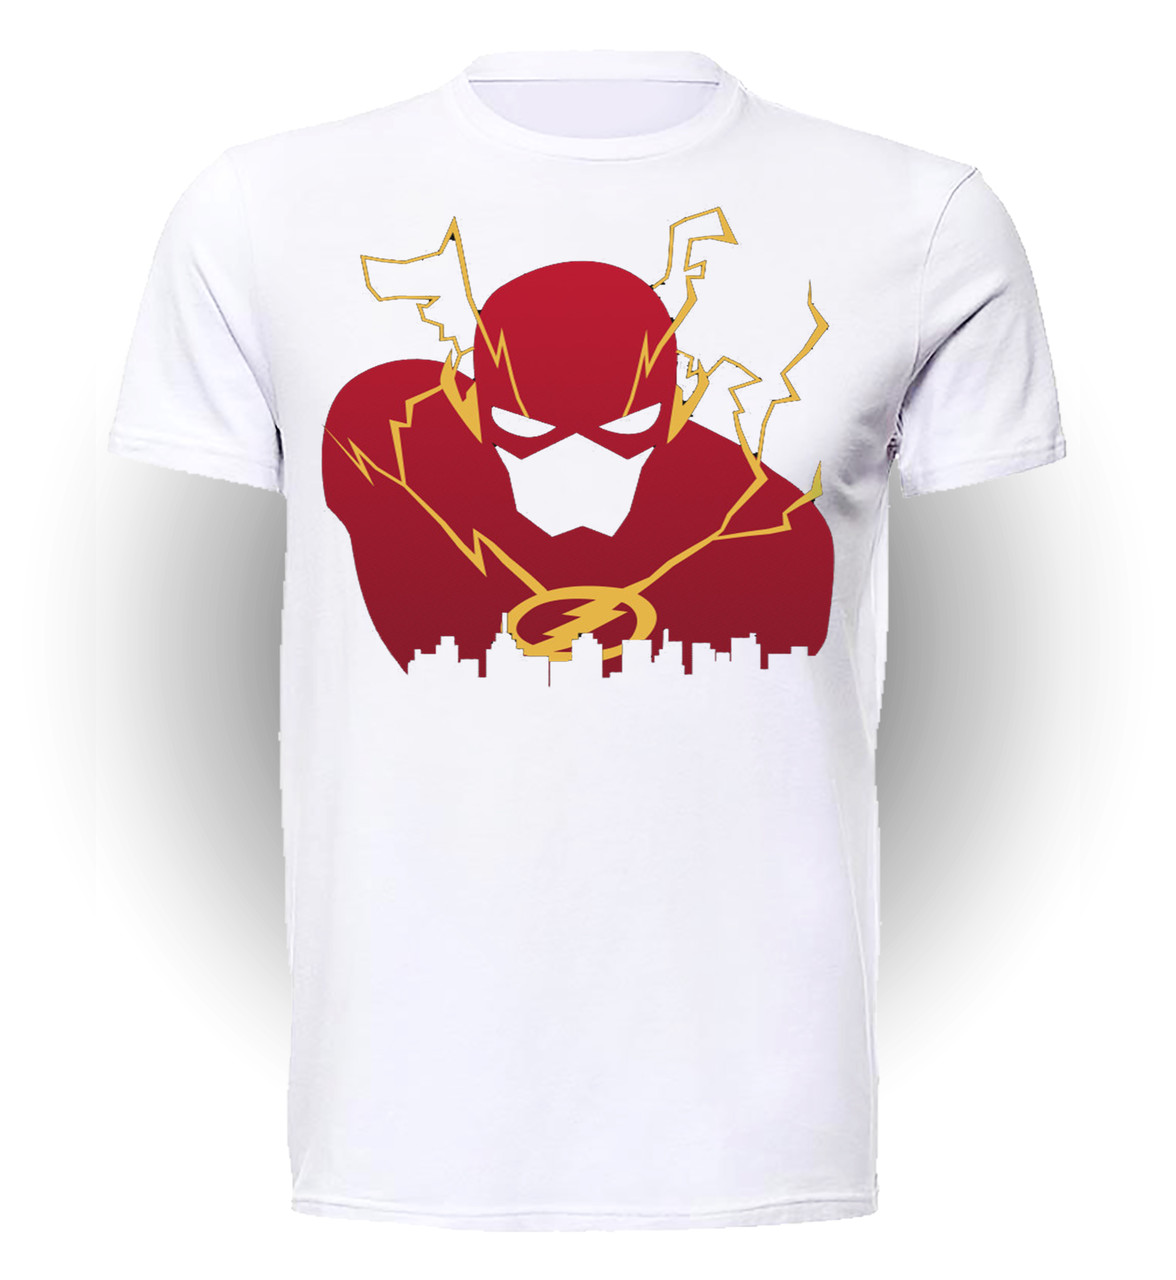 Футболка мужская GeekLand Флэш Flash в городе FL.01.013